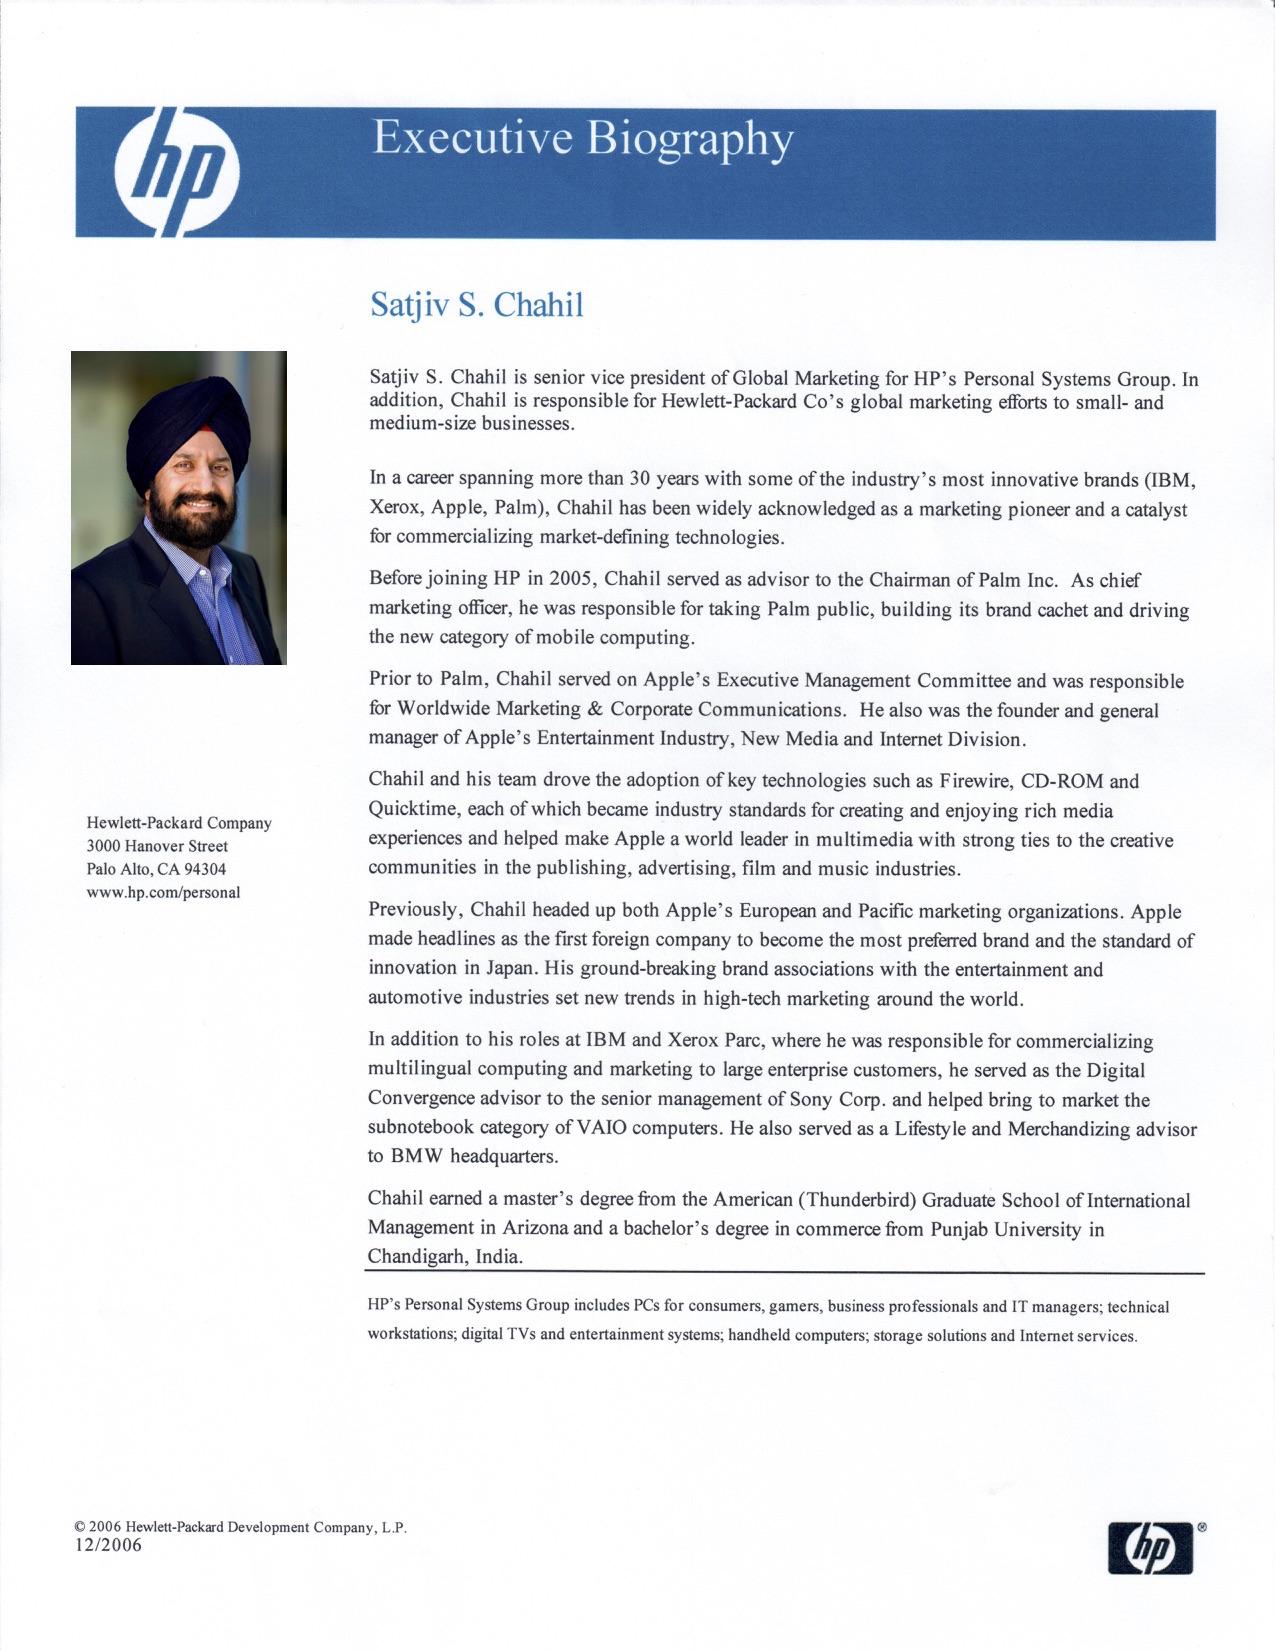 HP Biography